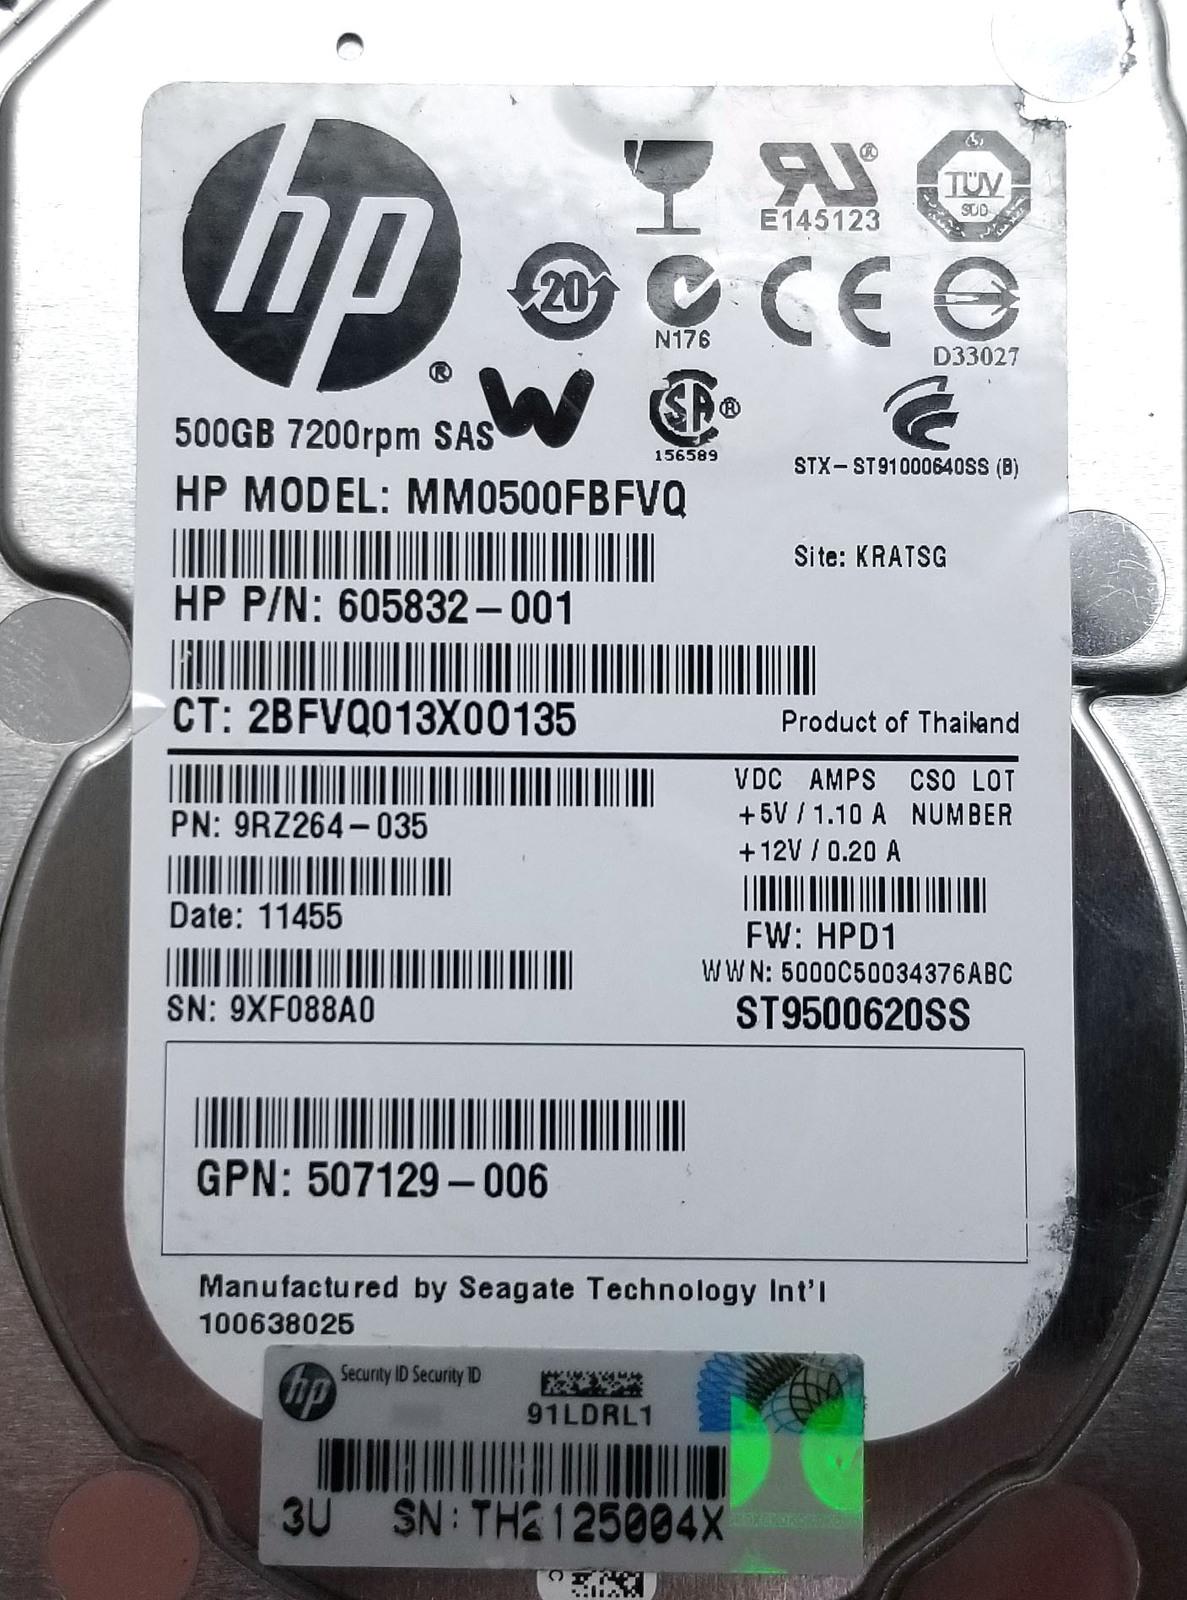 HP 500GB 7200RPM SAS Server HDD MM0500FBFVQ 605832-001 Bin:15